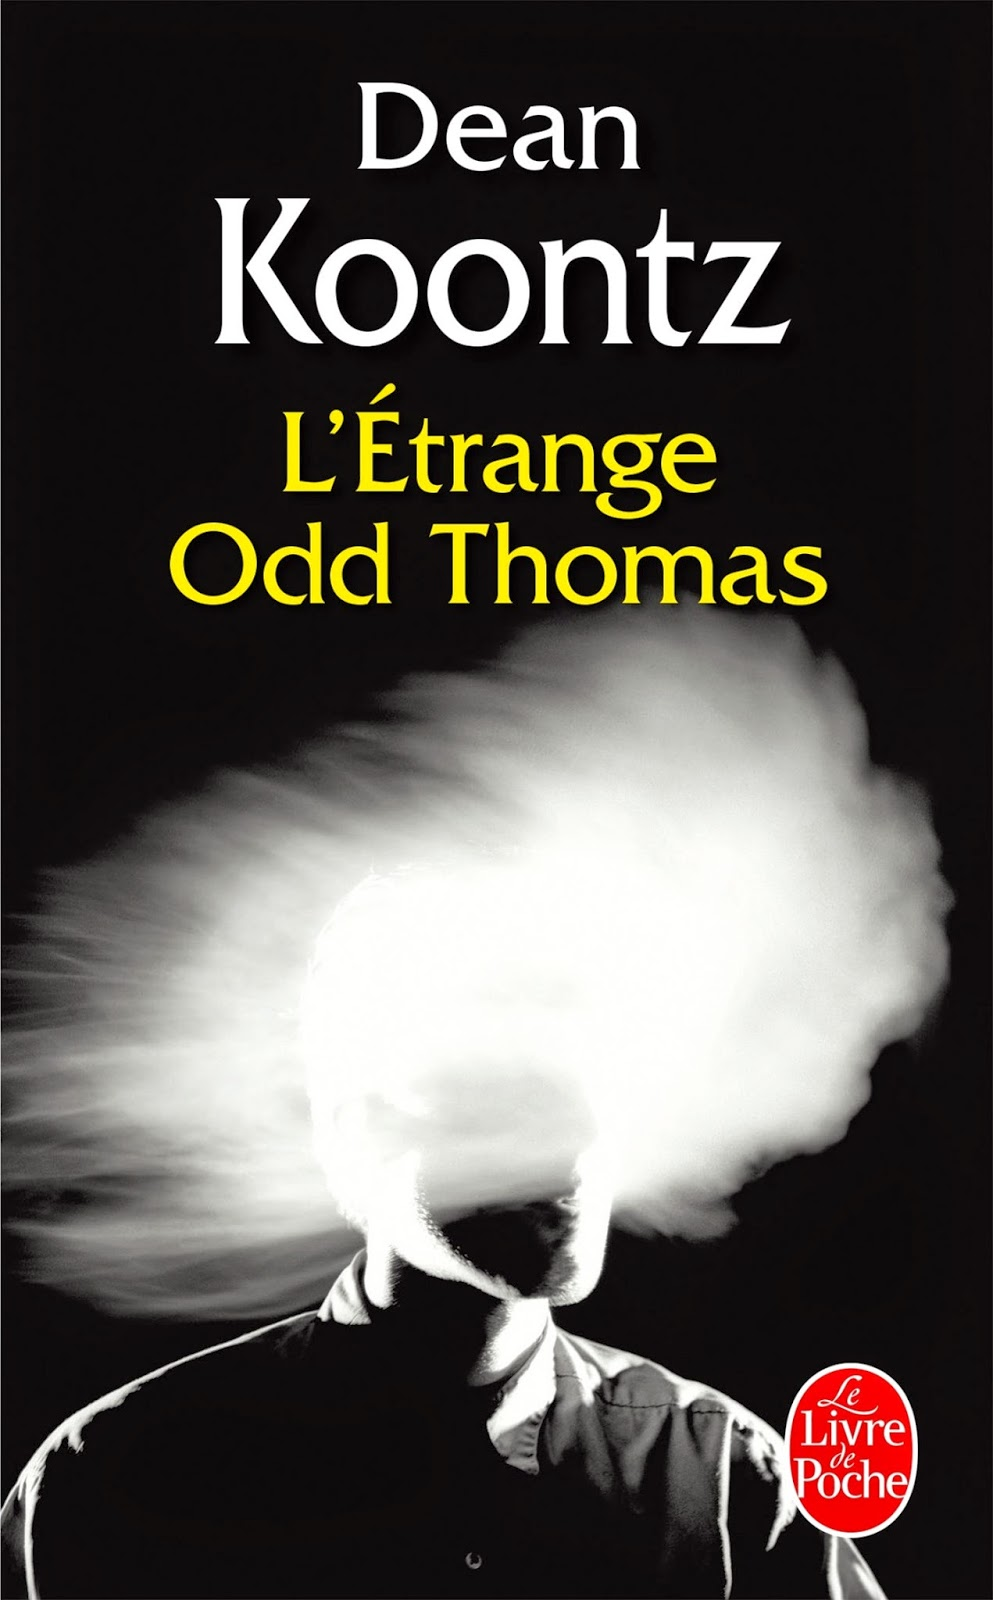 L'étrange Odd Thomas de Dean Koontz